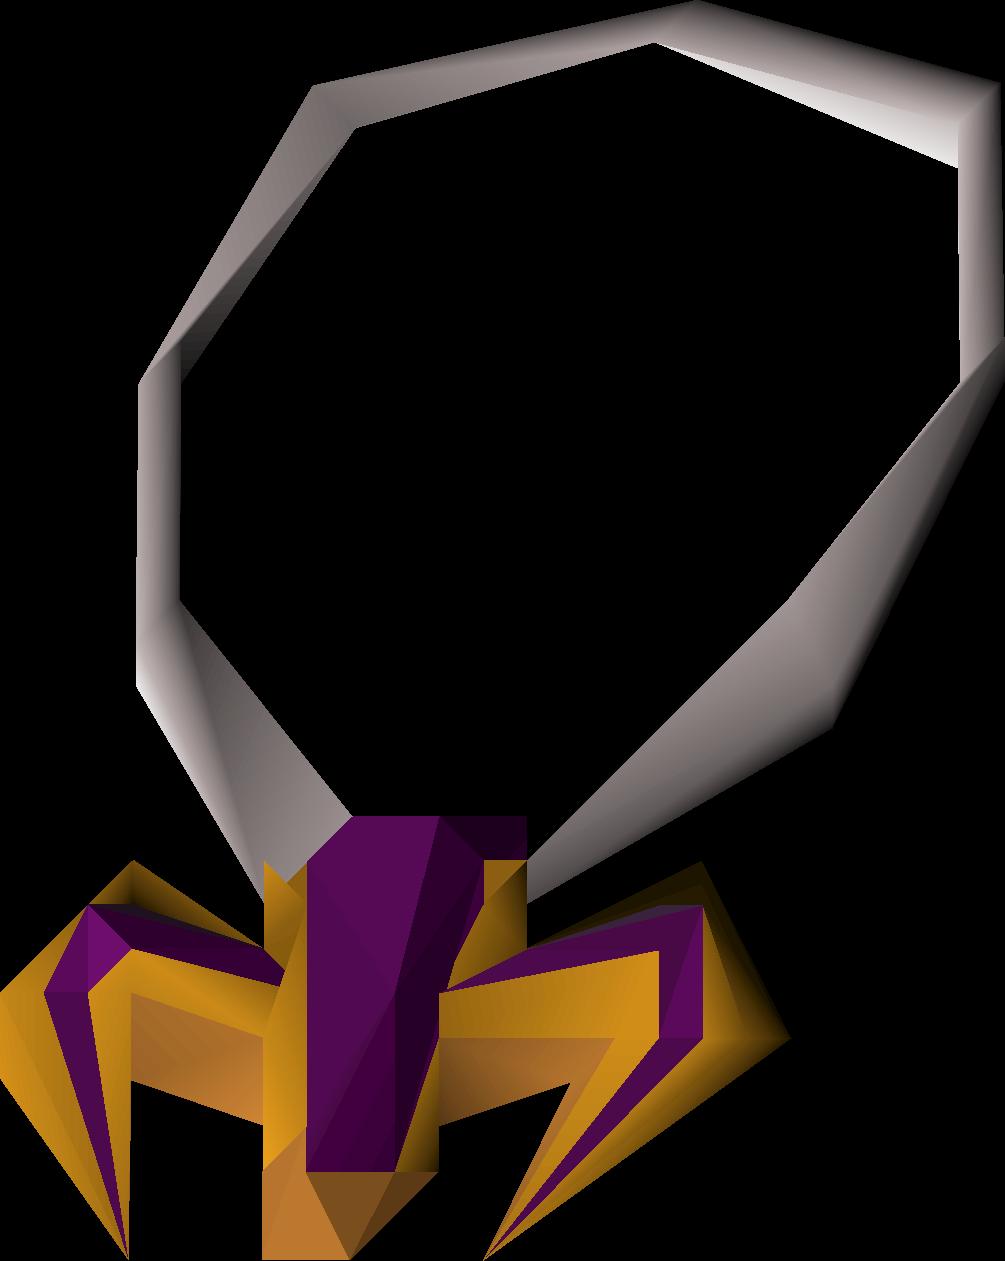 Amulet of glory (t) - OSRS Wiki